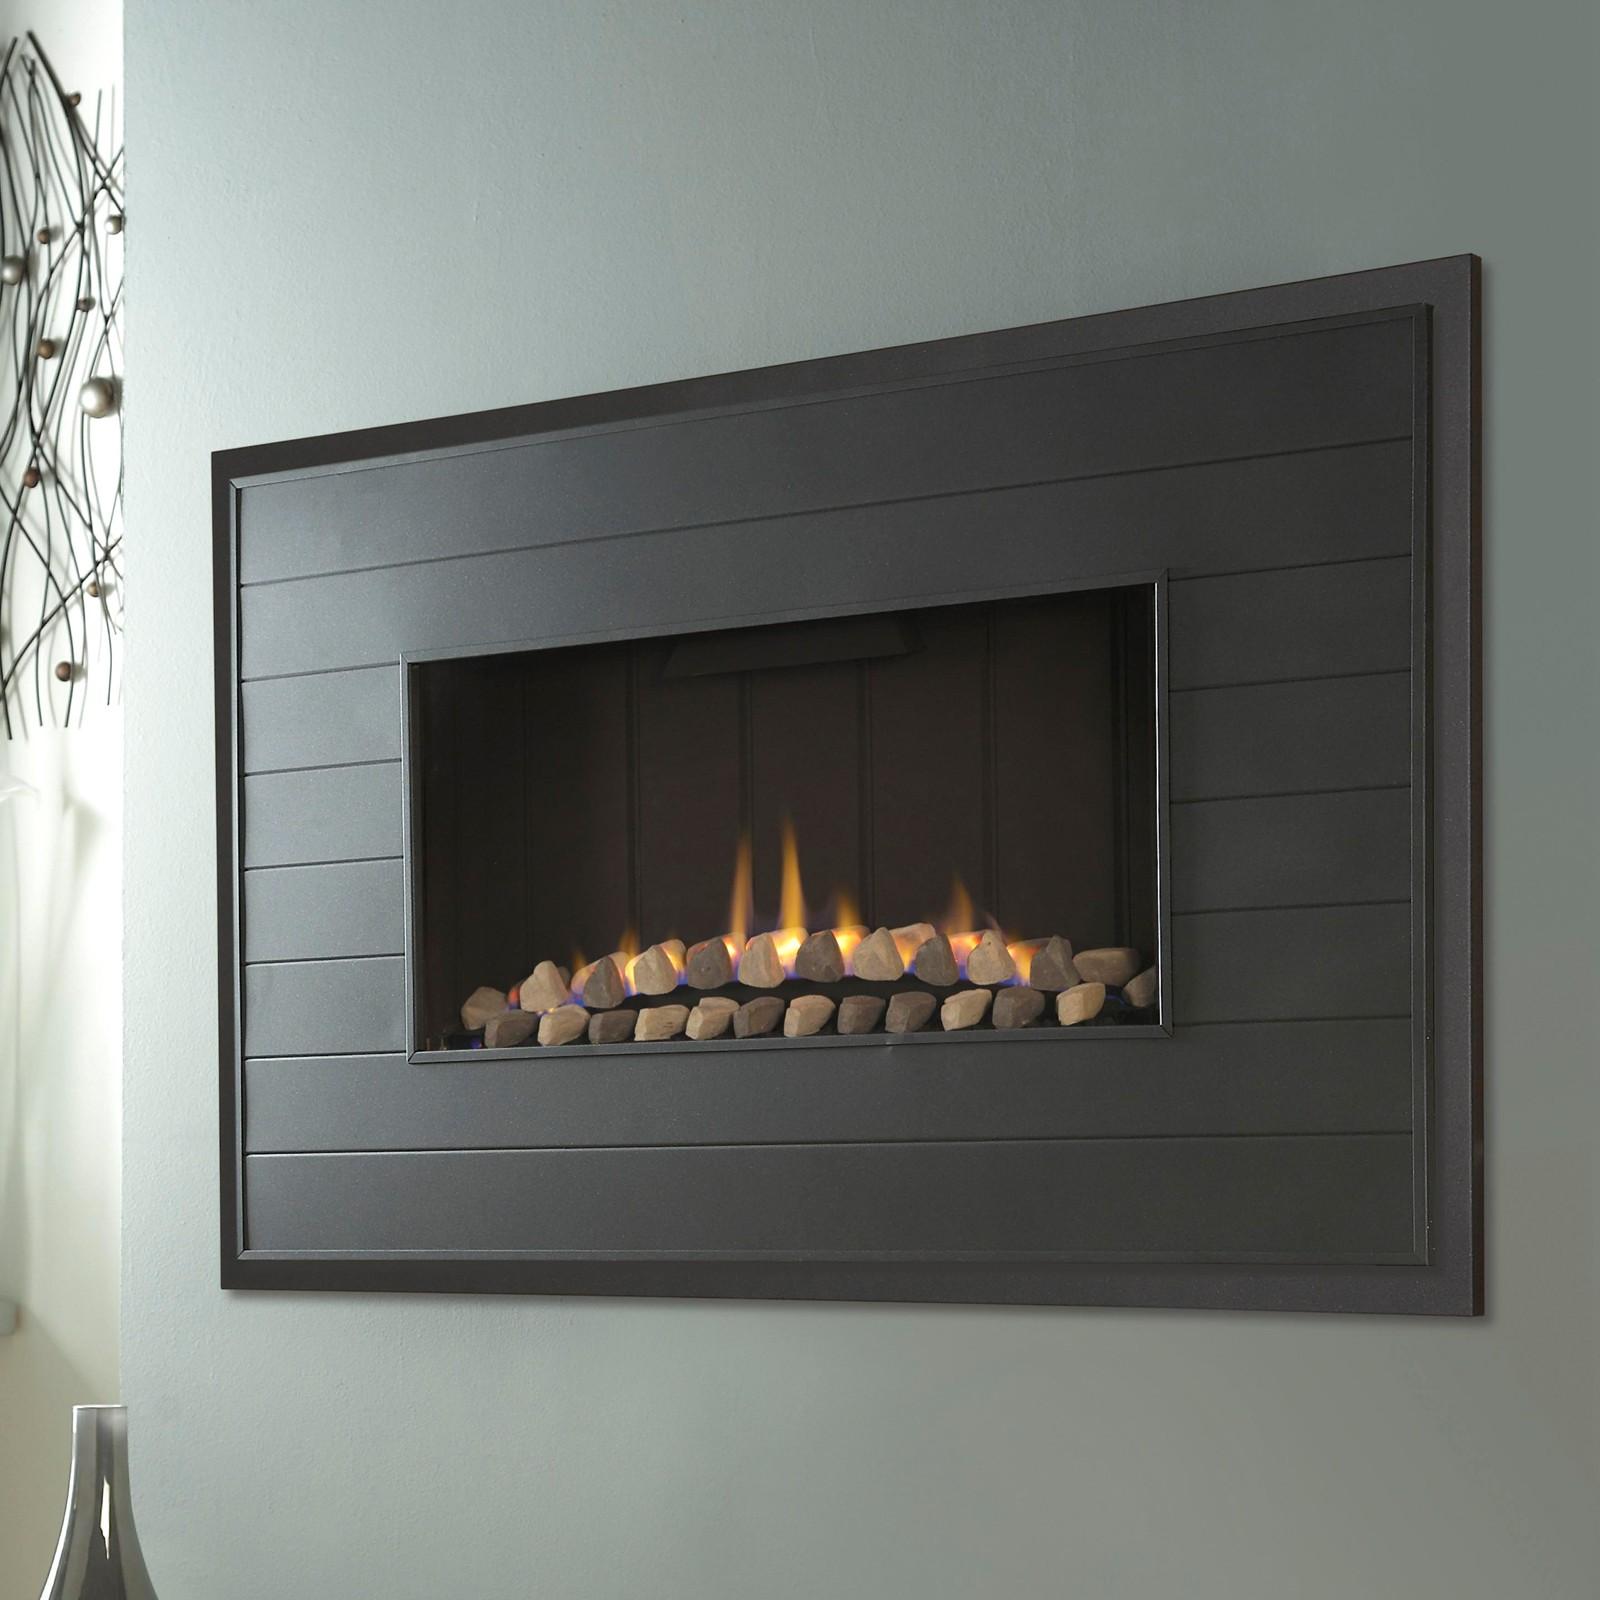 contemporary verine marcello high efficiency balanced gas fire